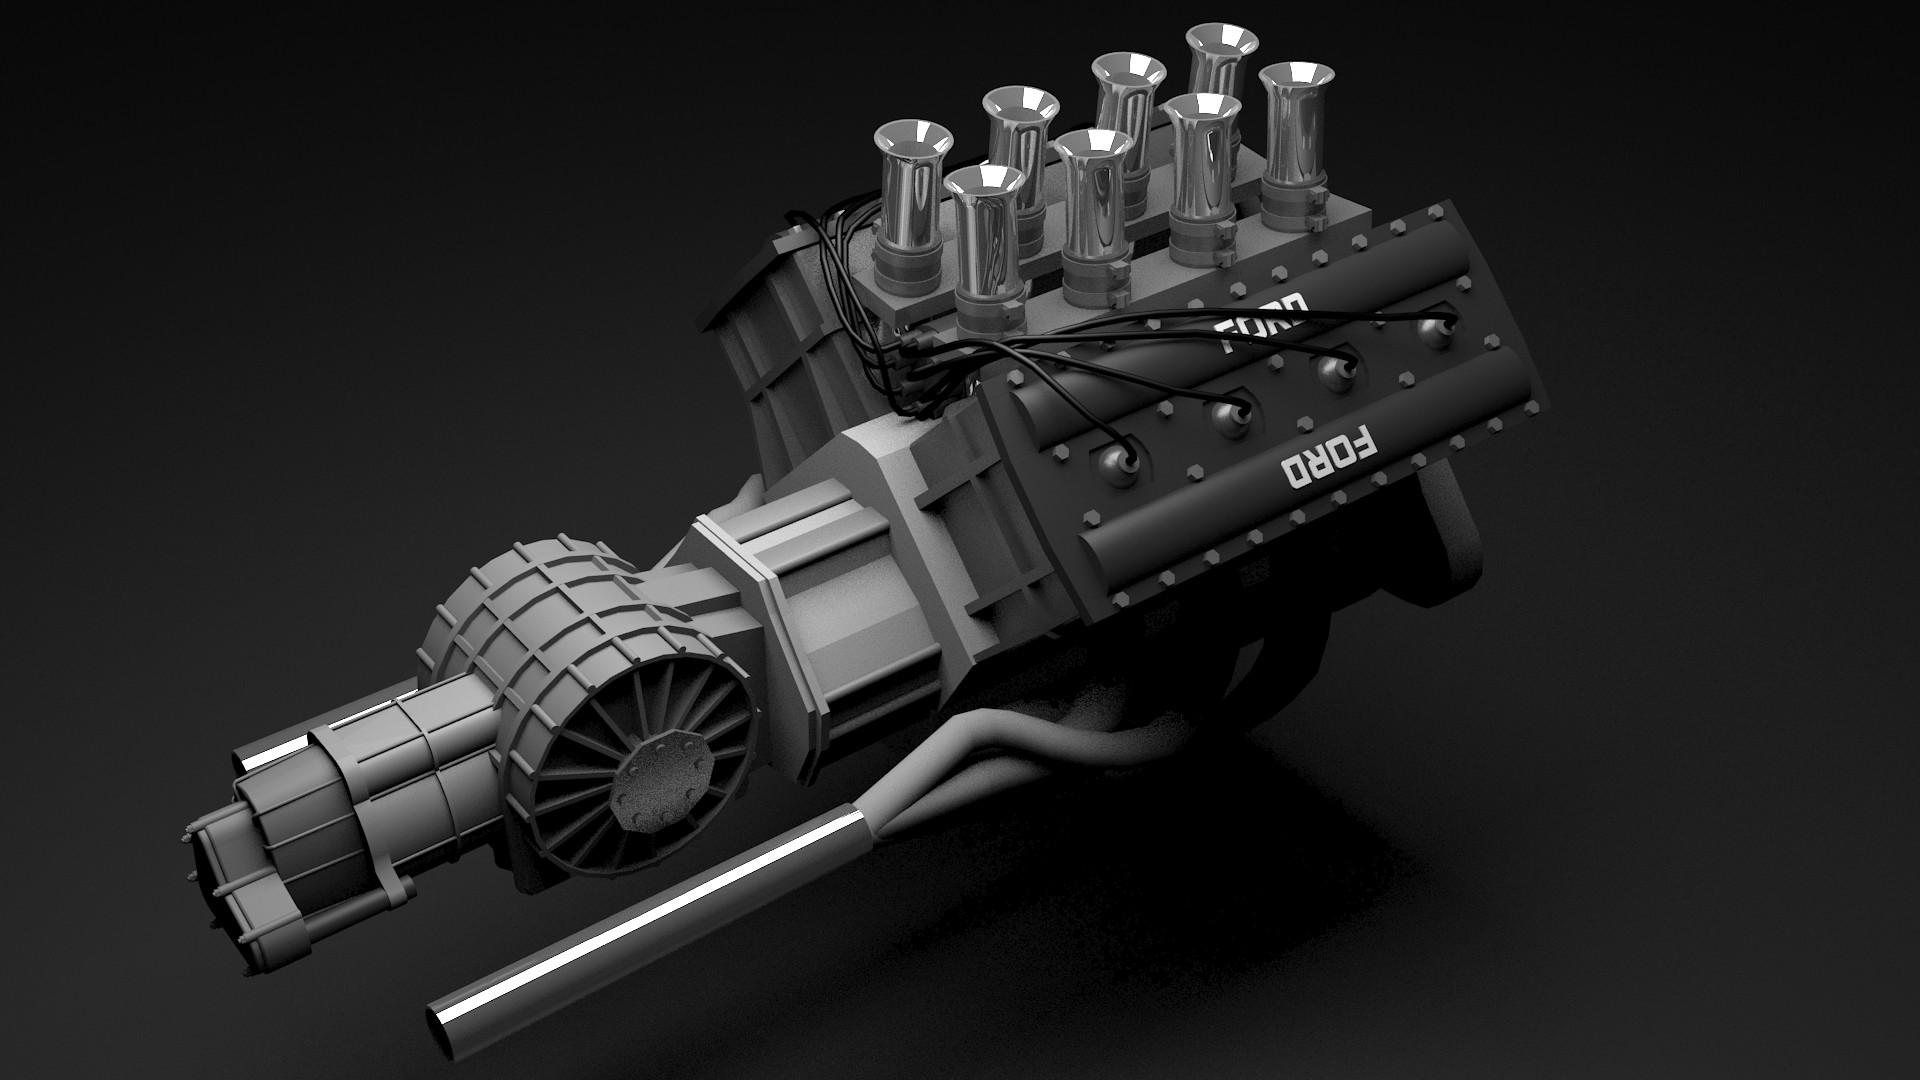 ArtStation - 1977 Ford Cosworth DFV engine, Arek Jarocki